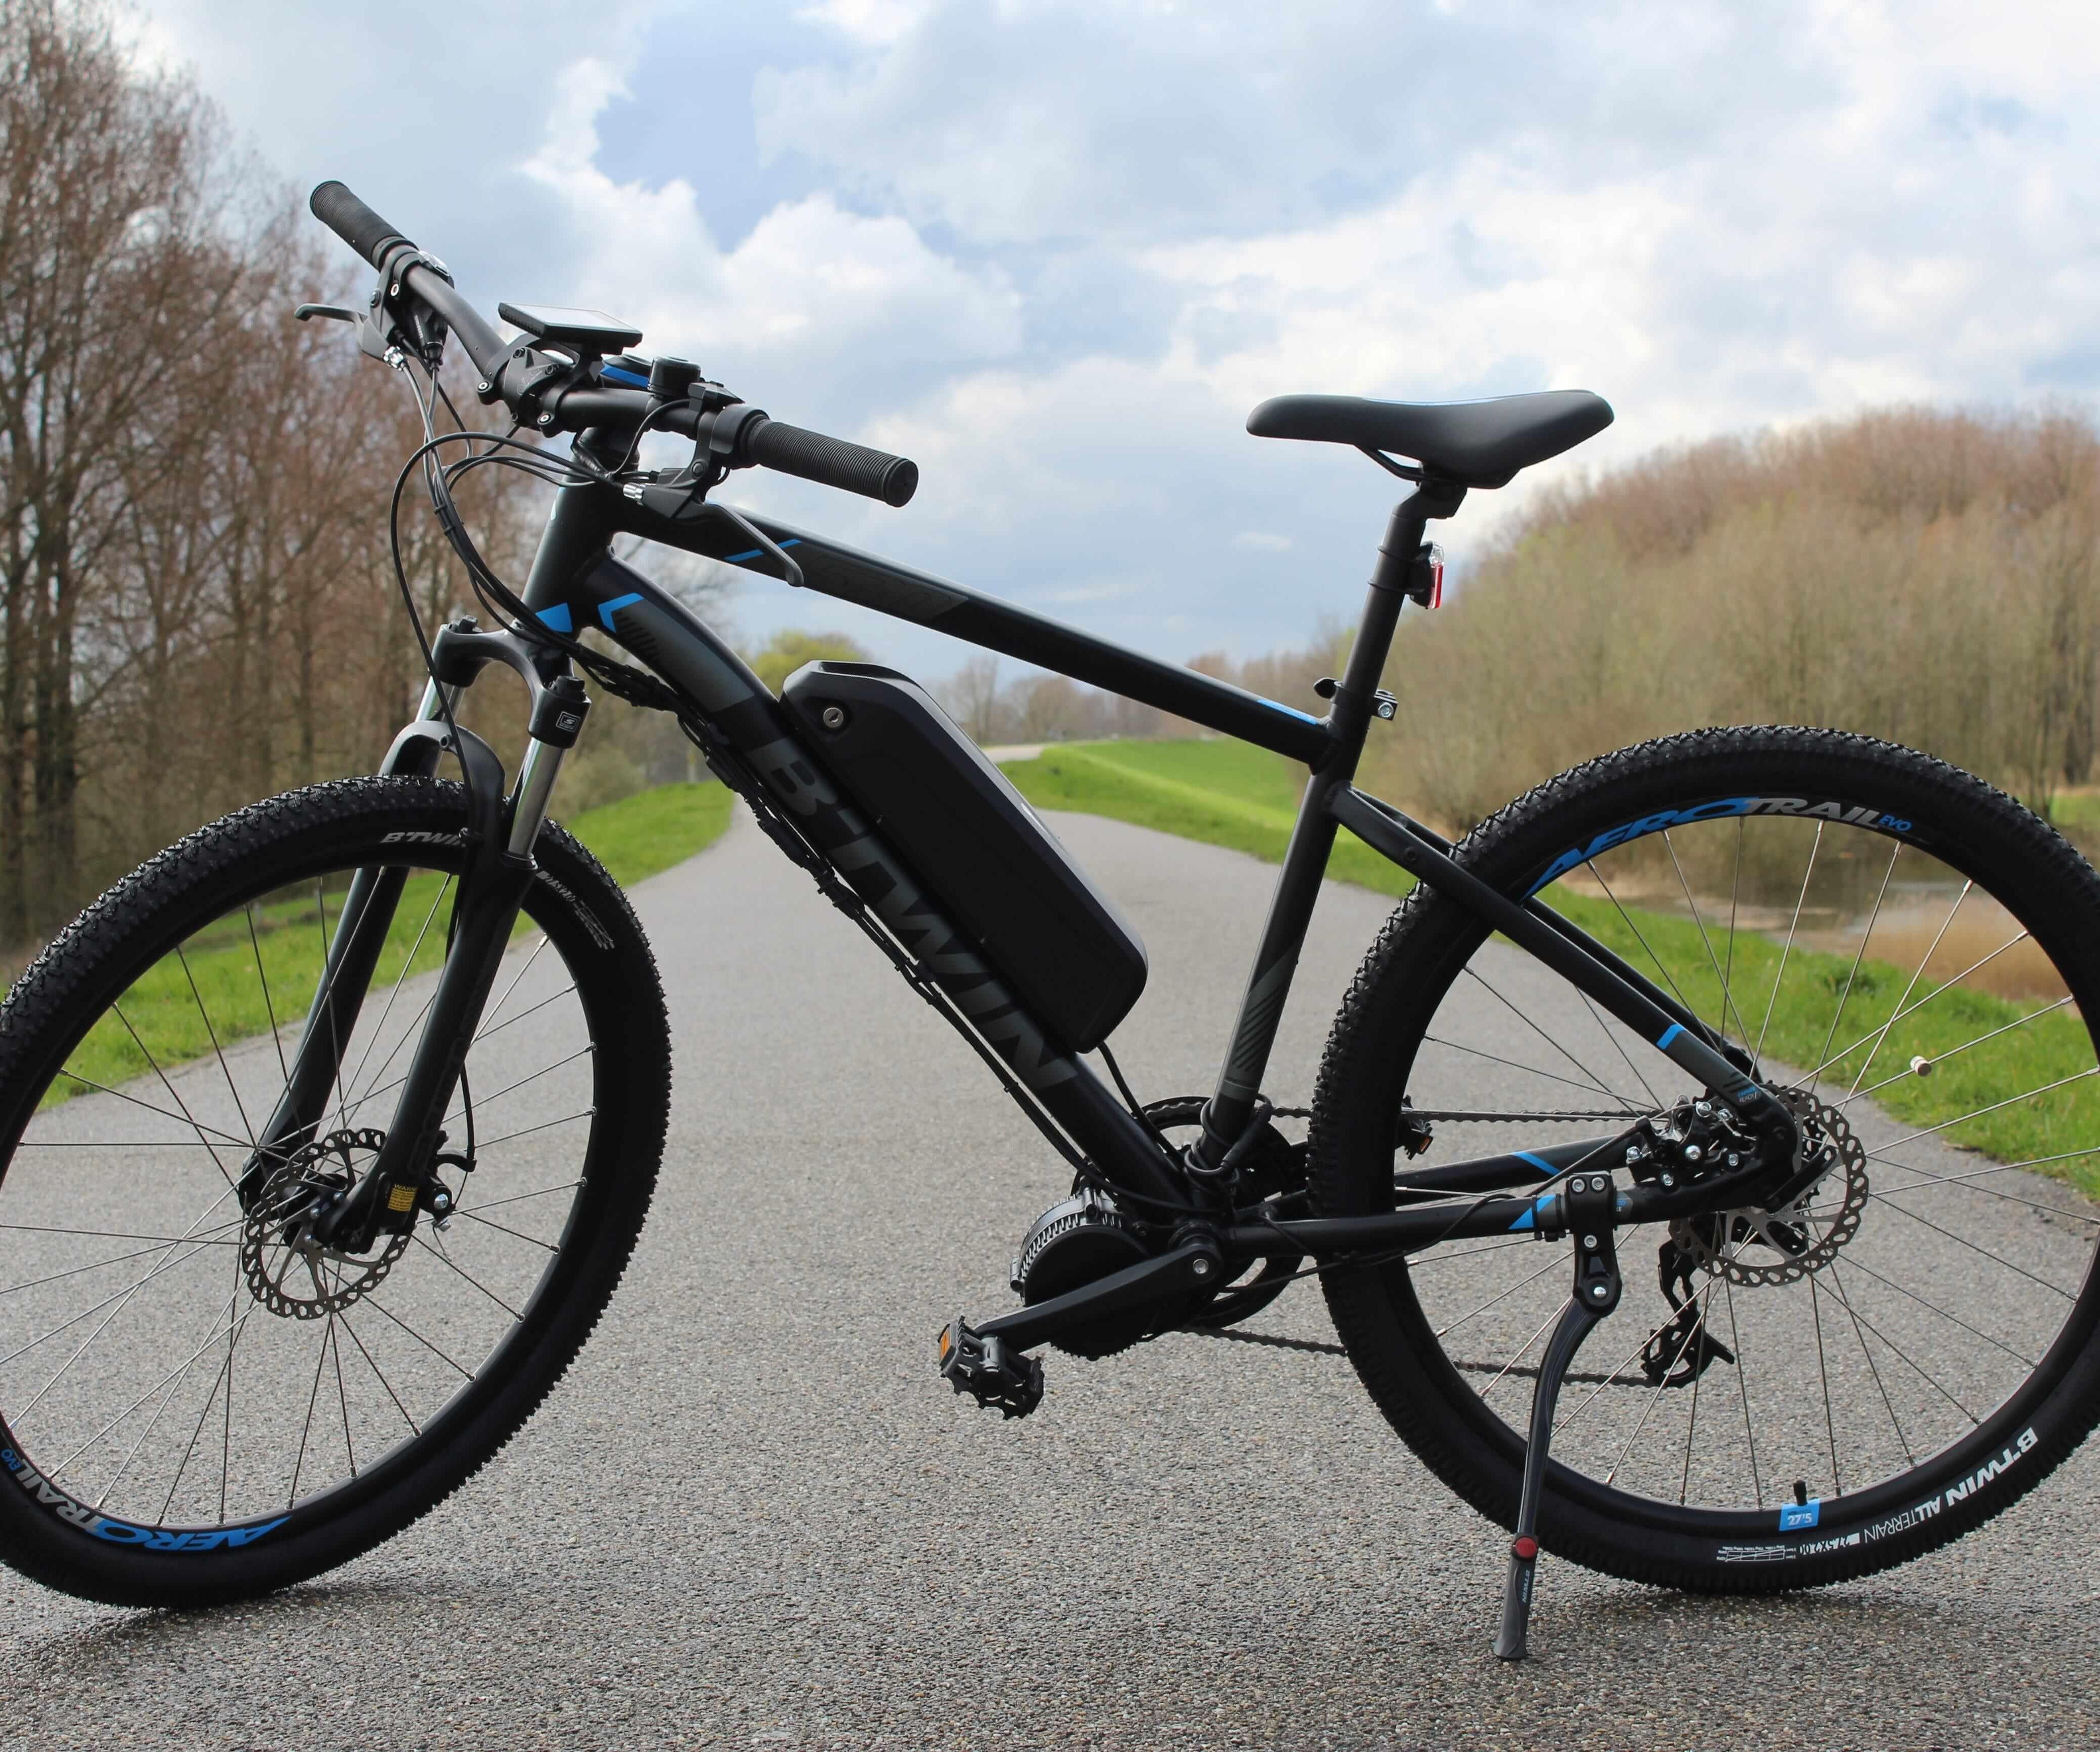 DIY 50km/h Value Bafang E-bike Build